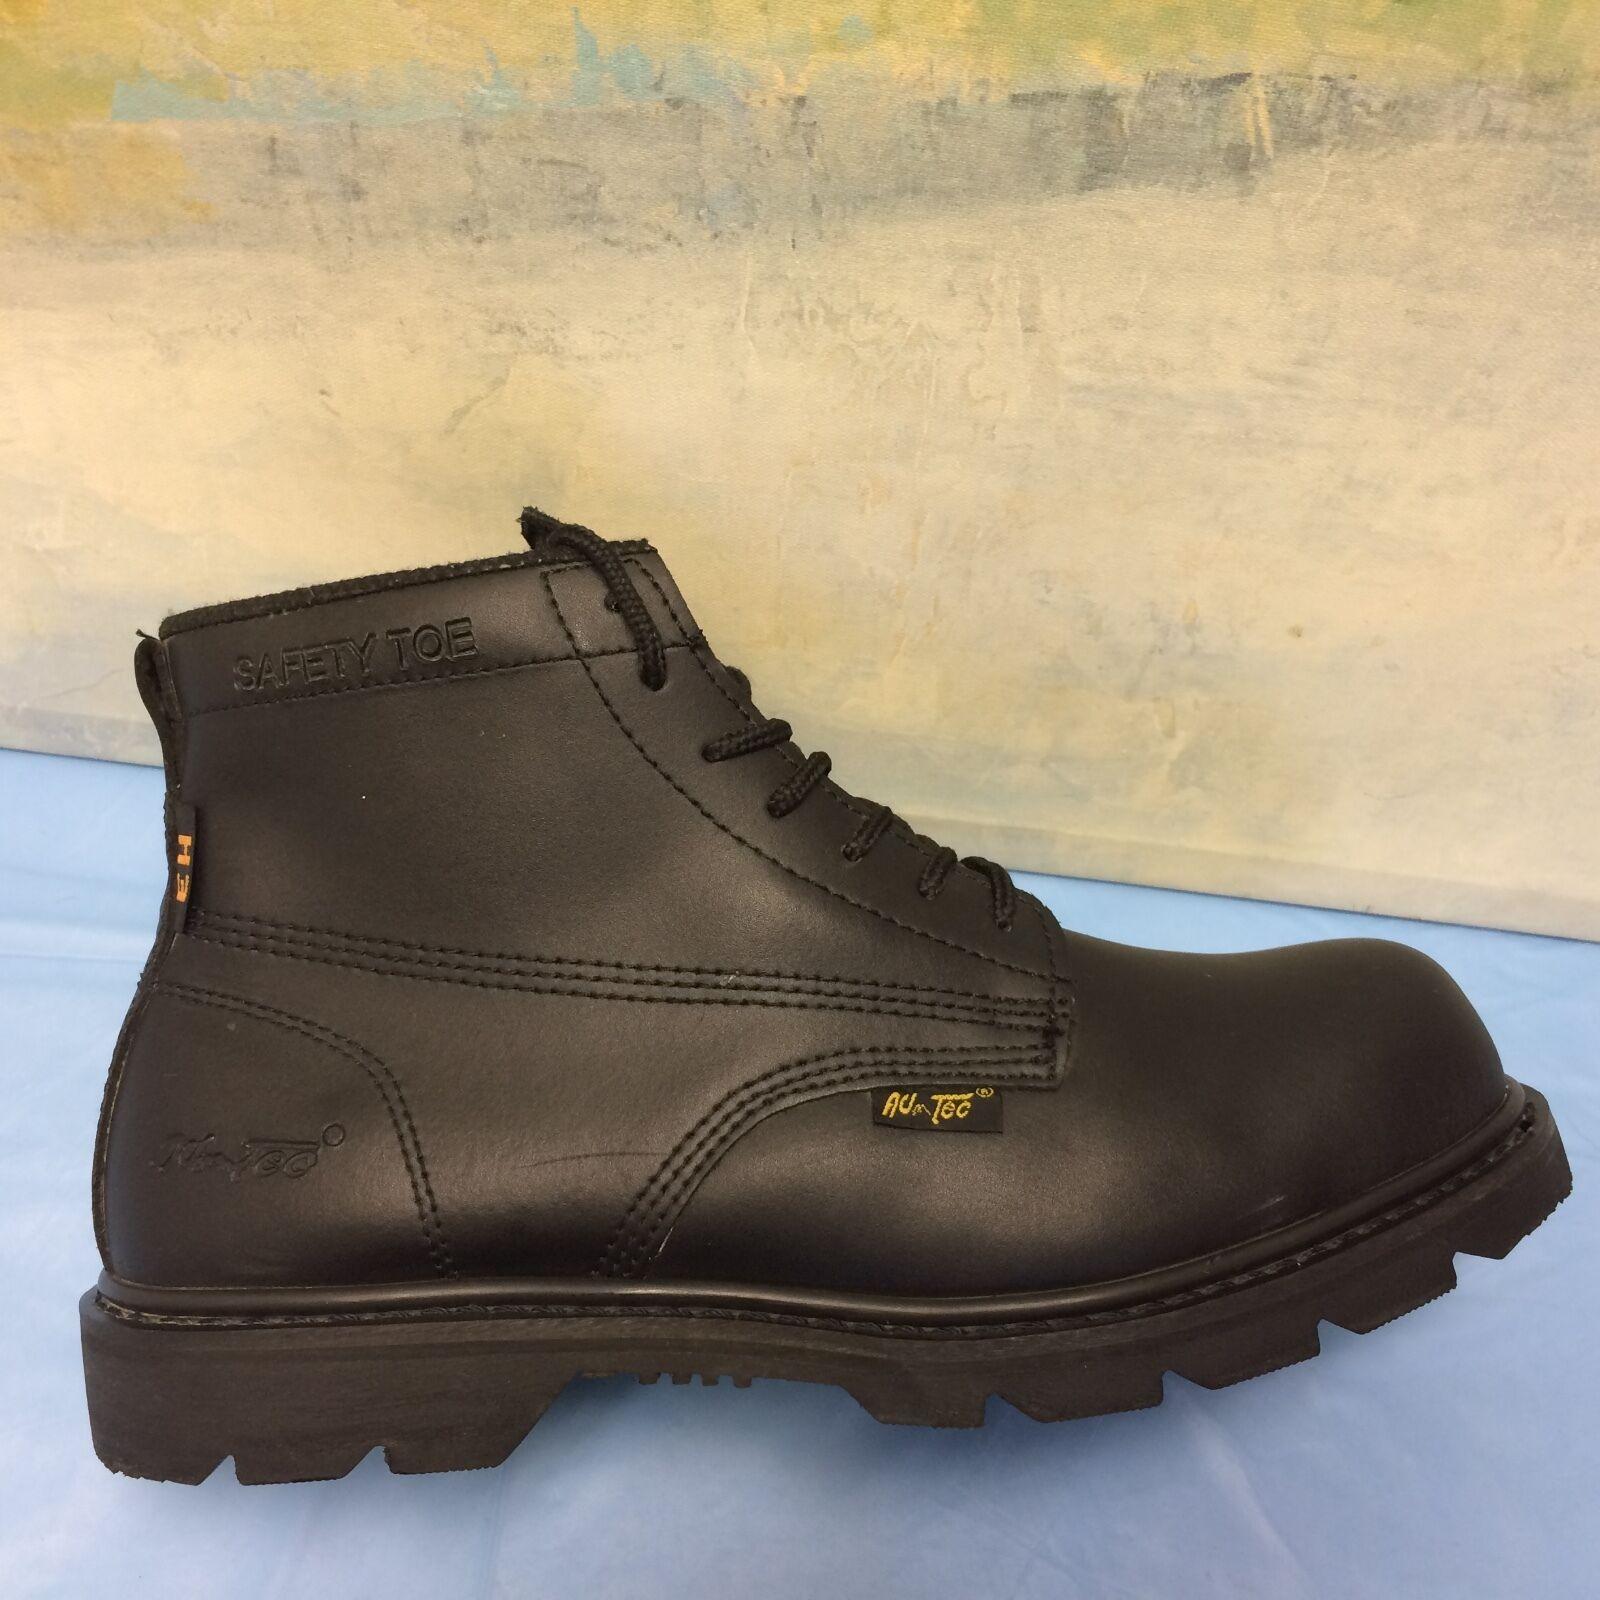 Ad Tec Men's Extra Wide Steel Toe Electrical Hazard 6  Work Boots 10 EH